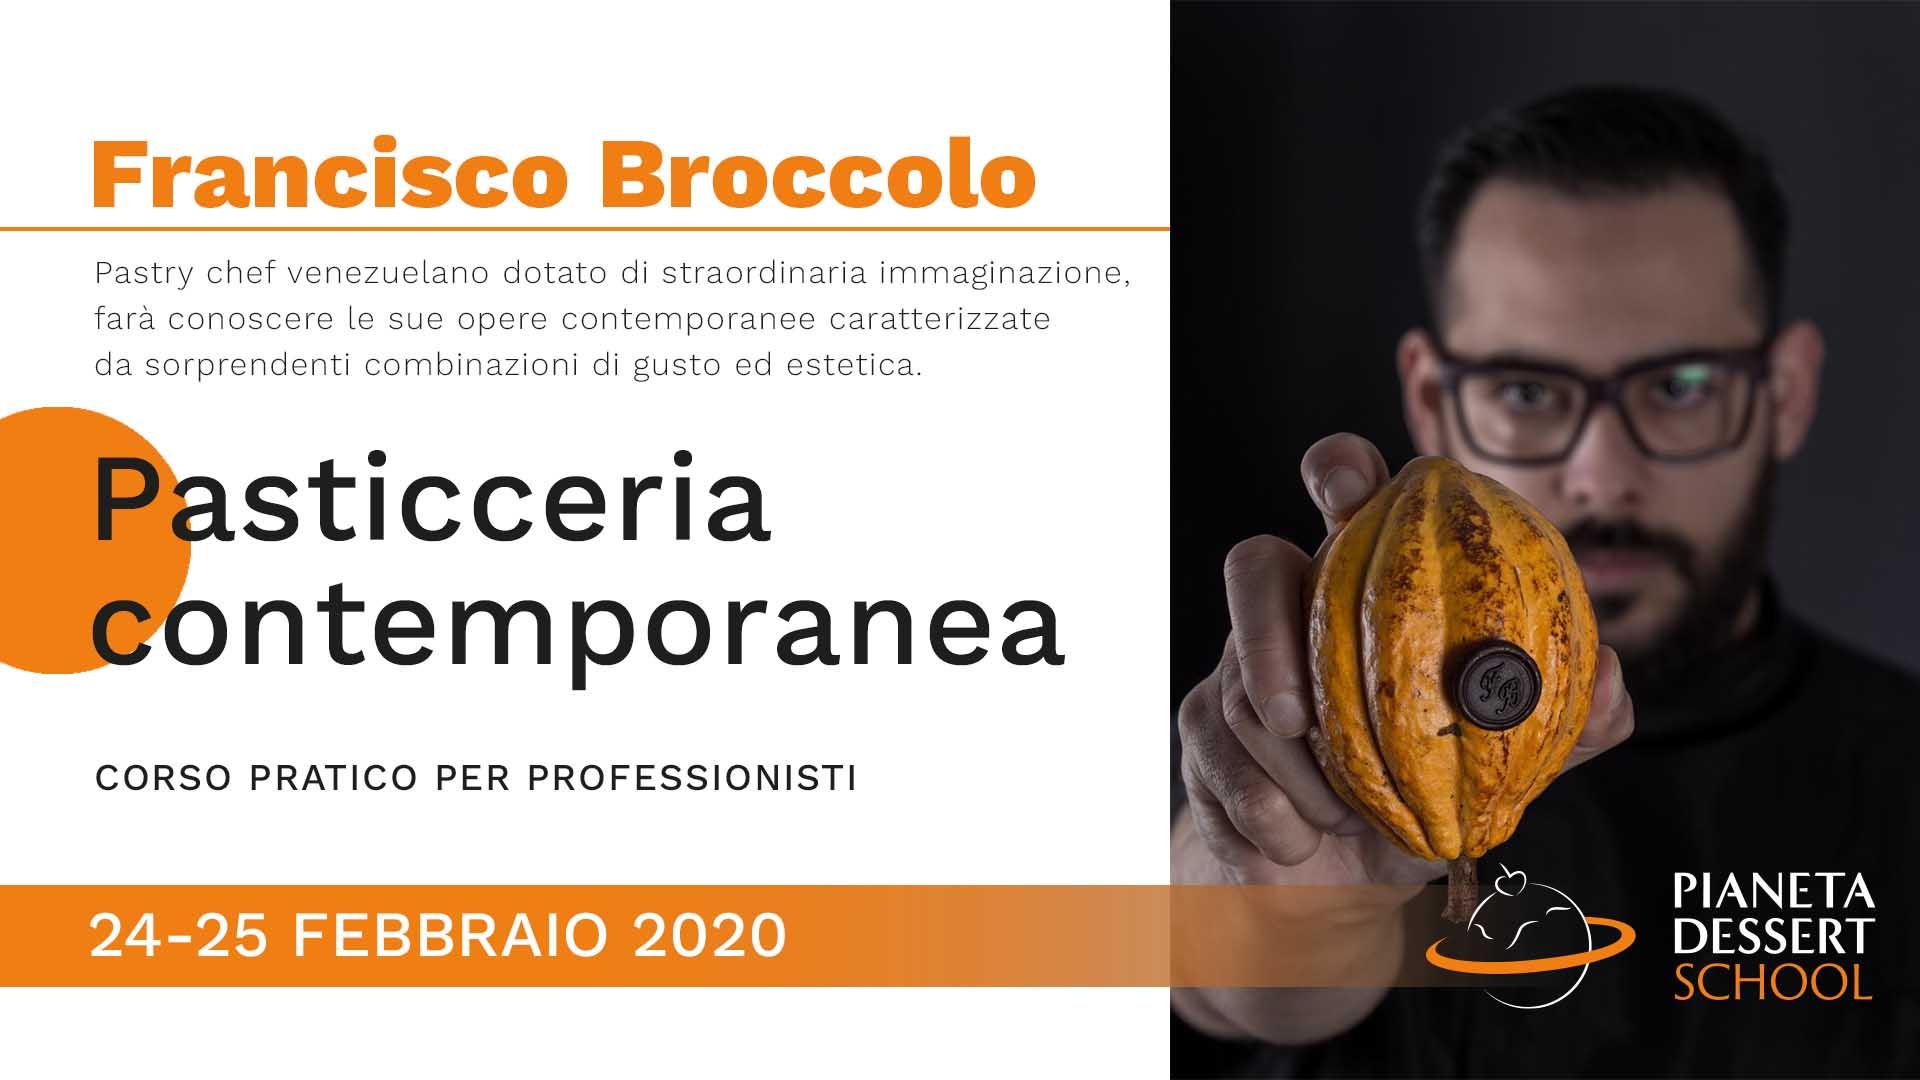 Francisco Broccolo - Pianeta Dessert School